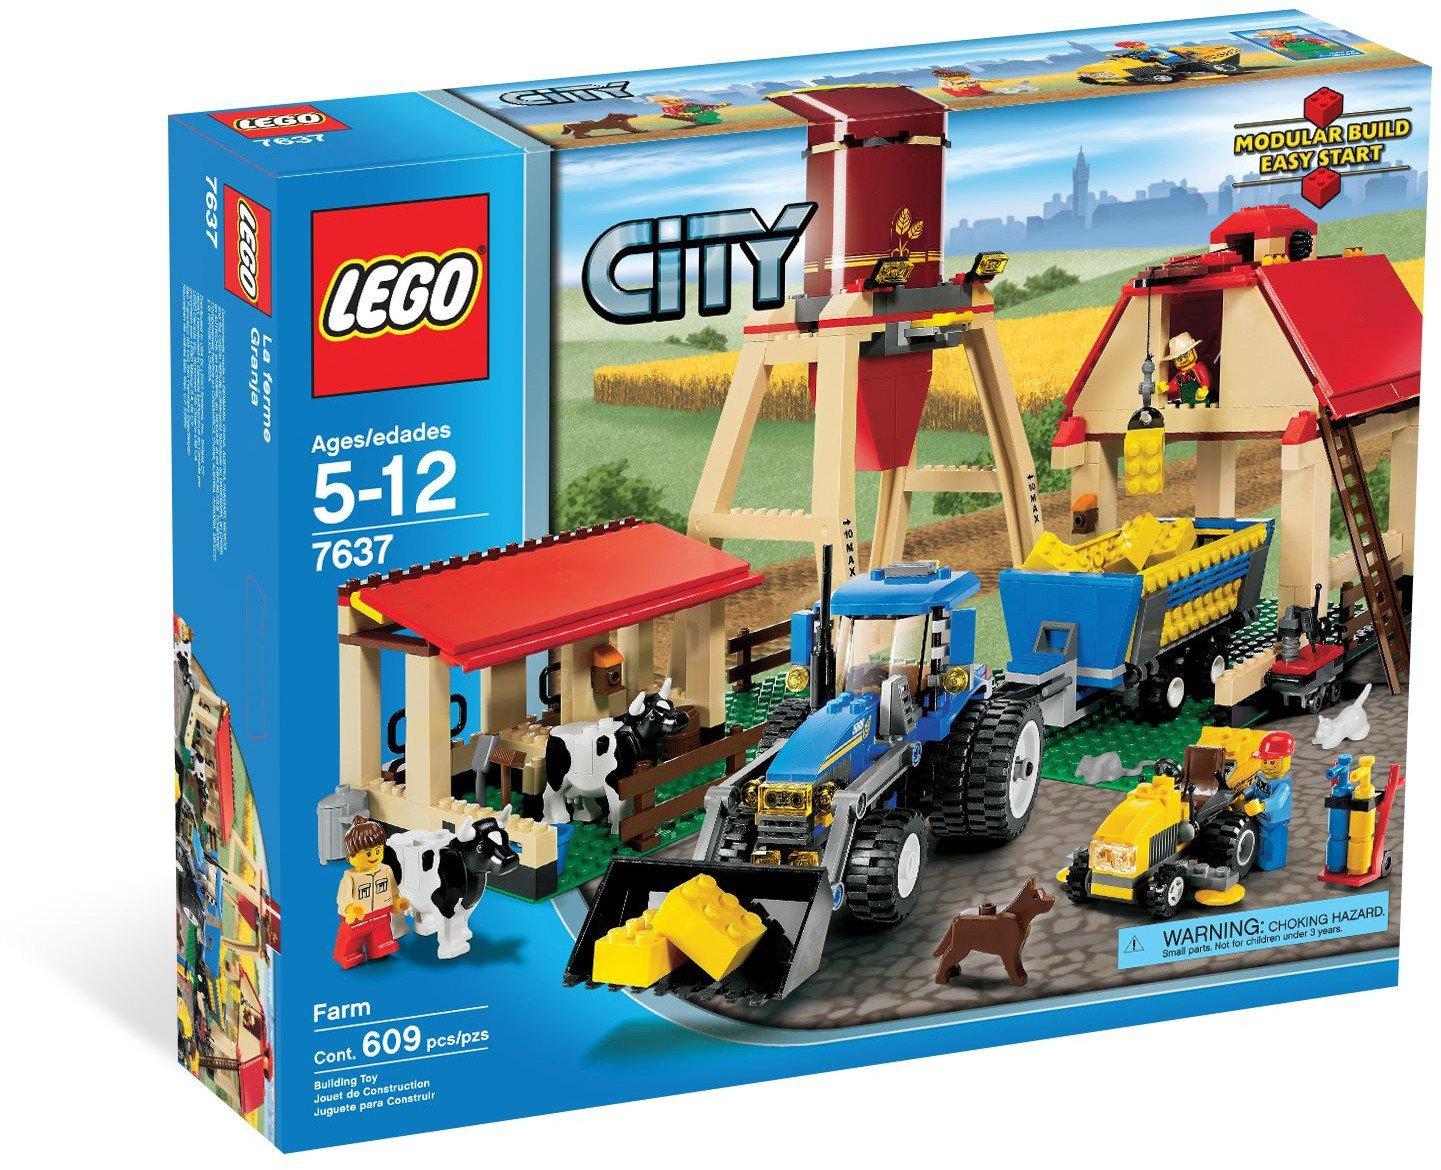 2009 Lego City Farm 7637